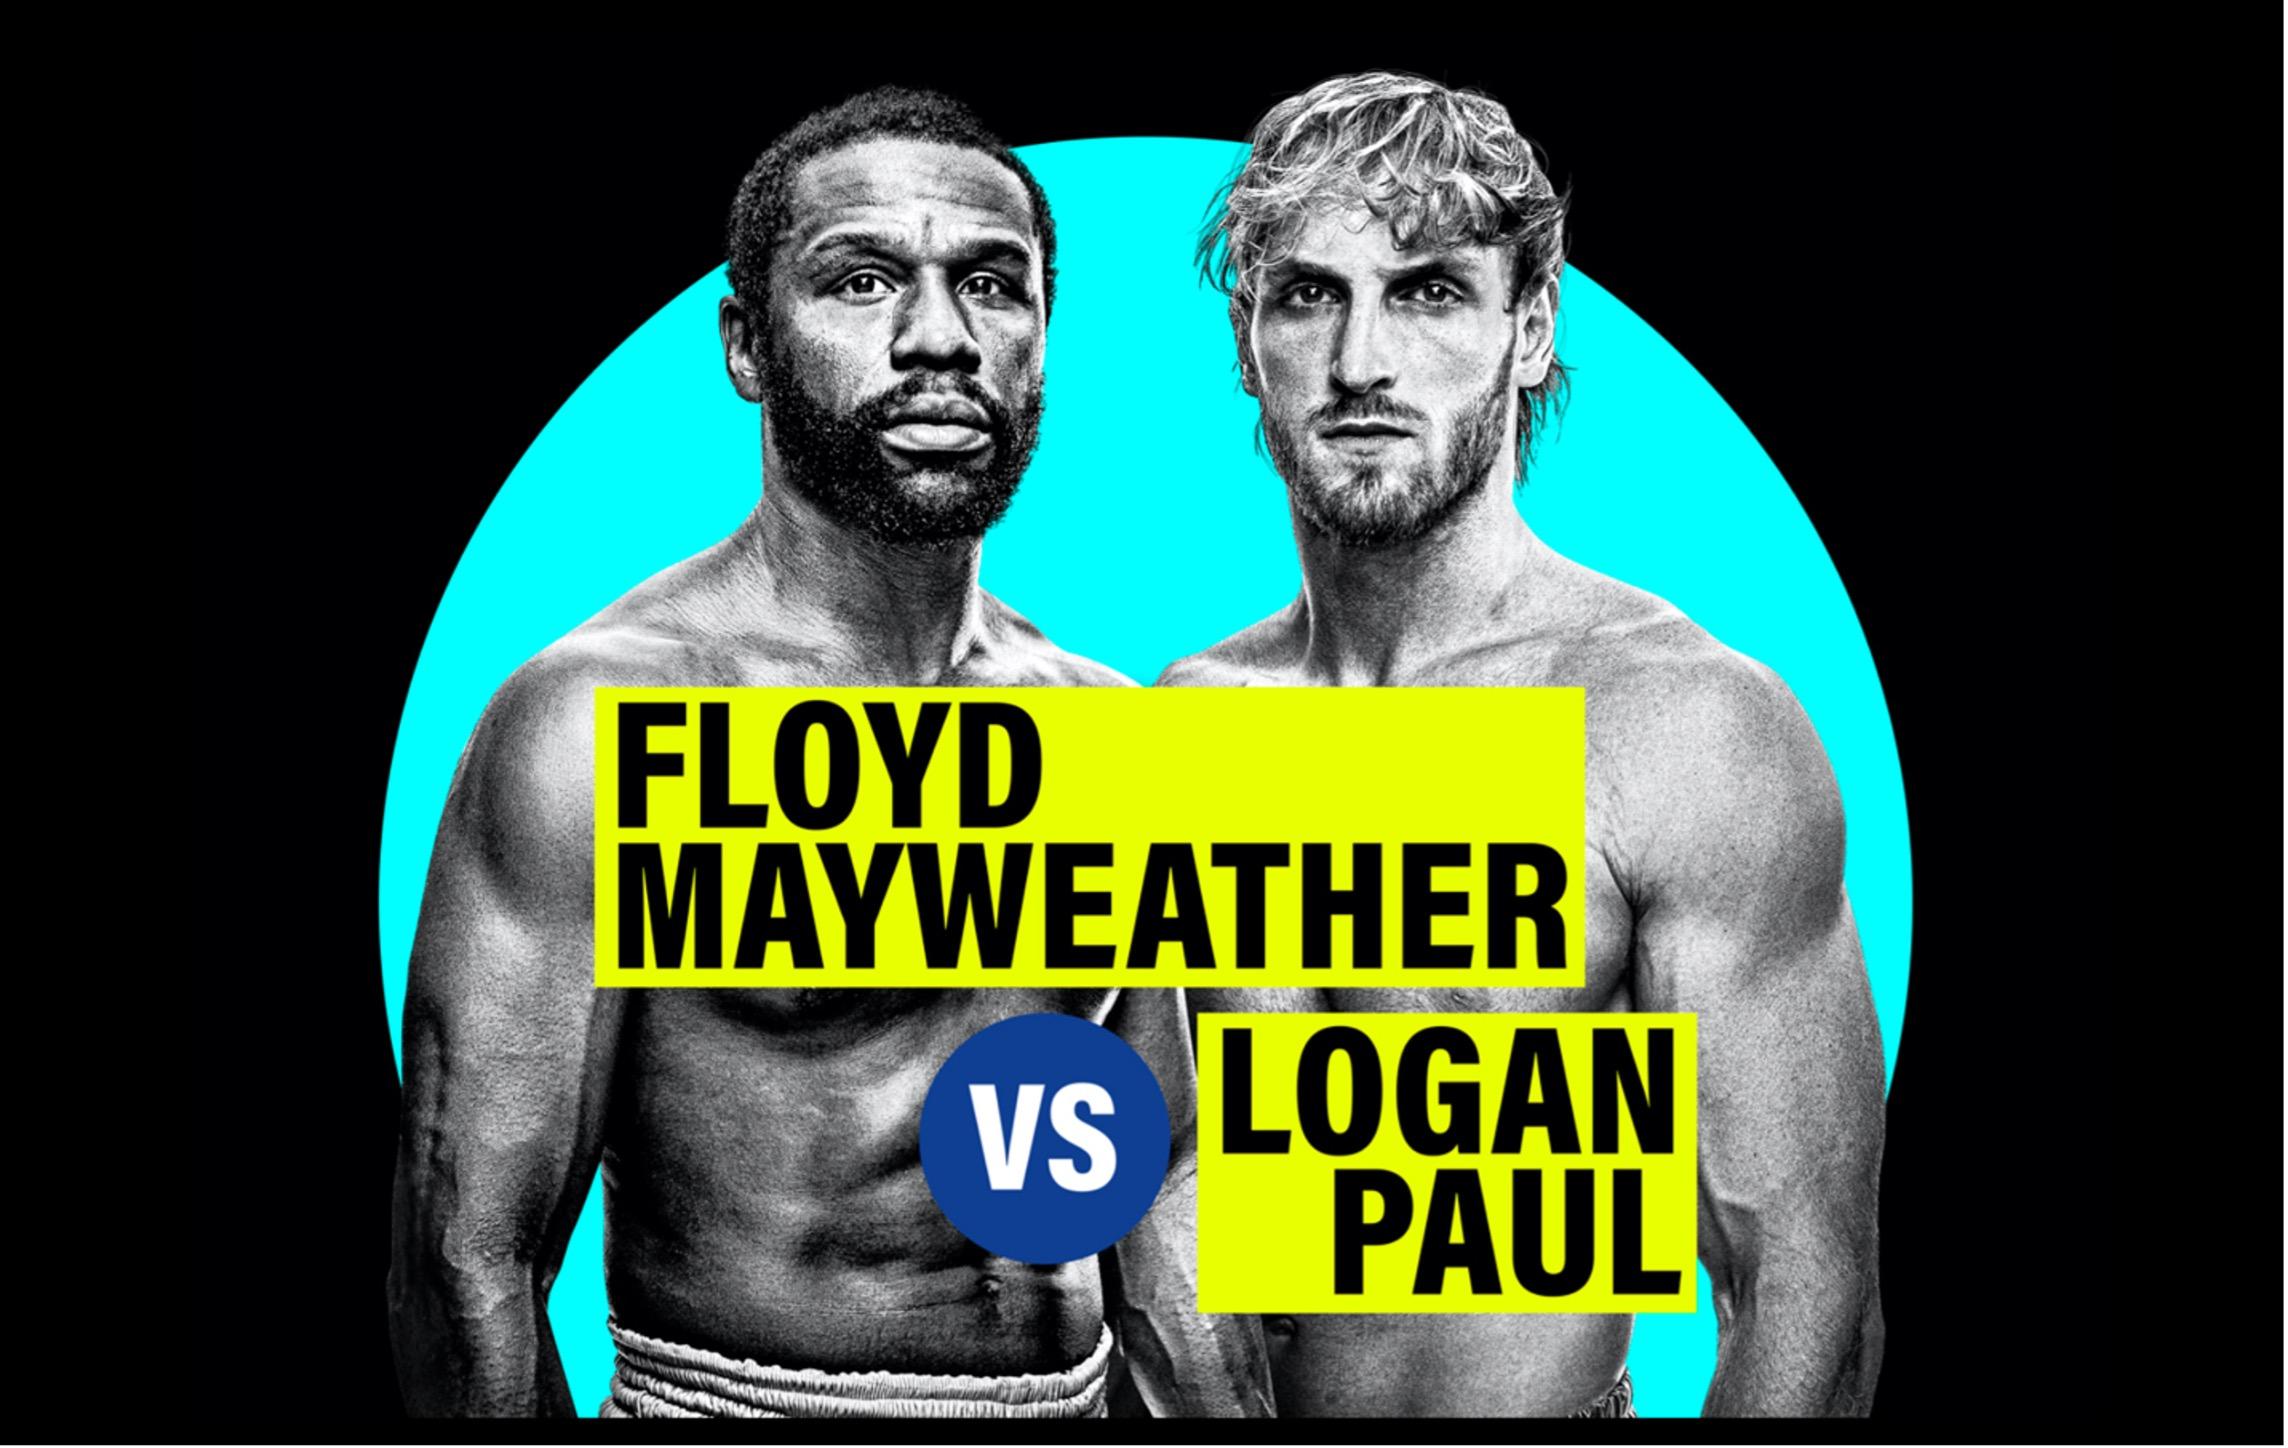 Floyd Mayweather vs. Logan Paul PPV